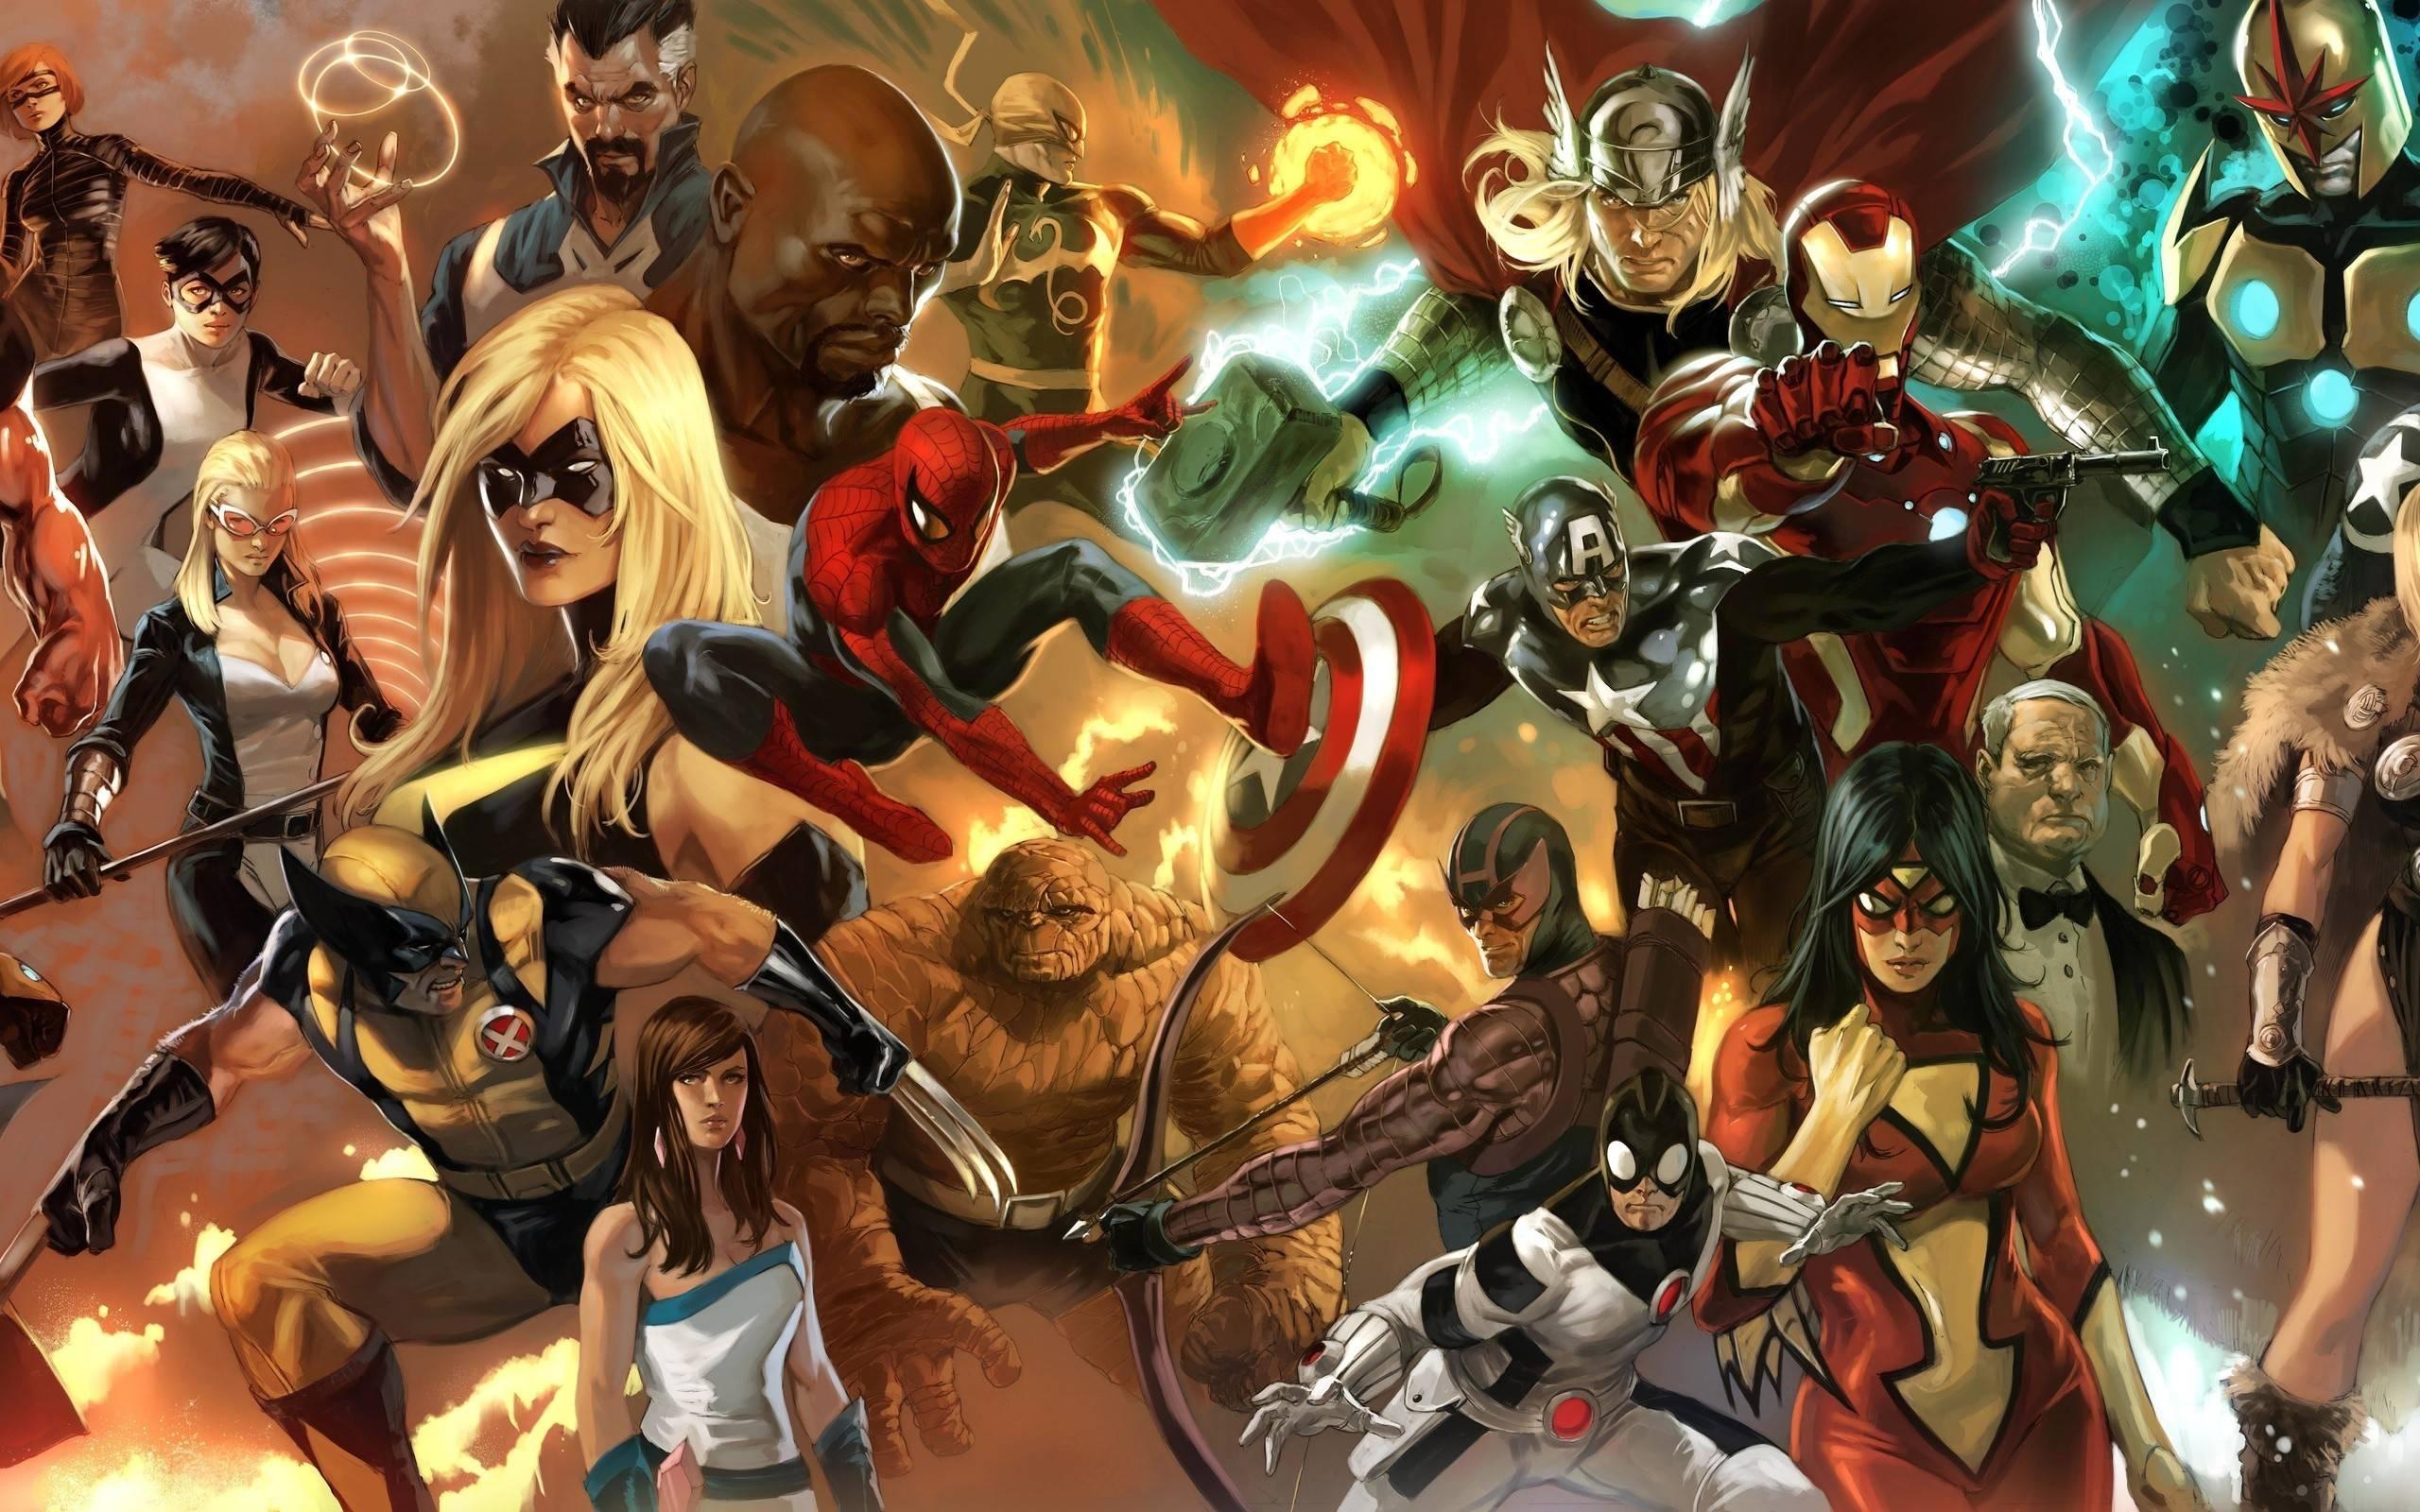 Marvel Wallpaper - Full HD wallpaper search